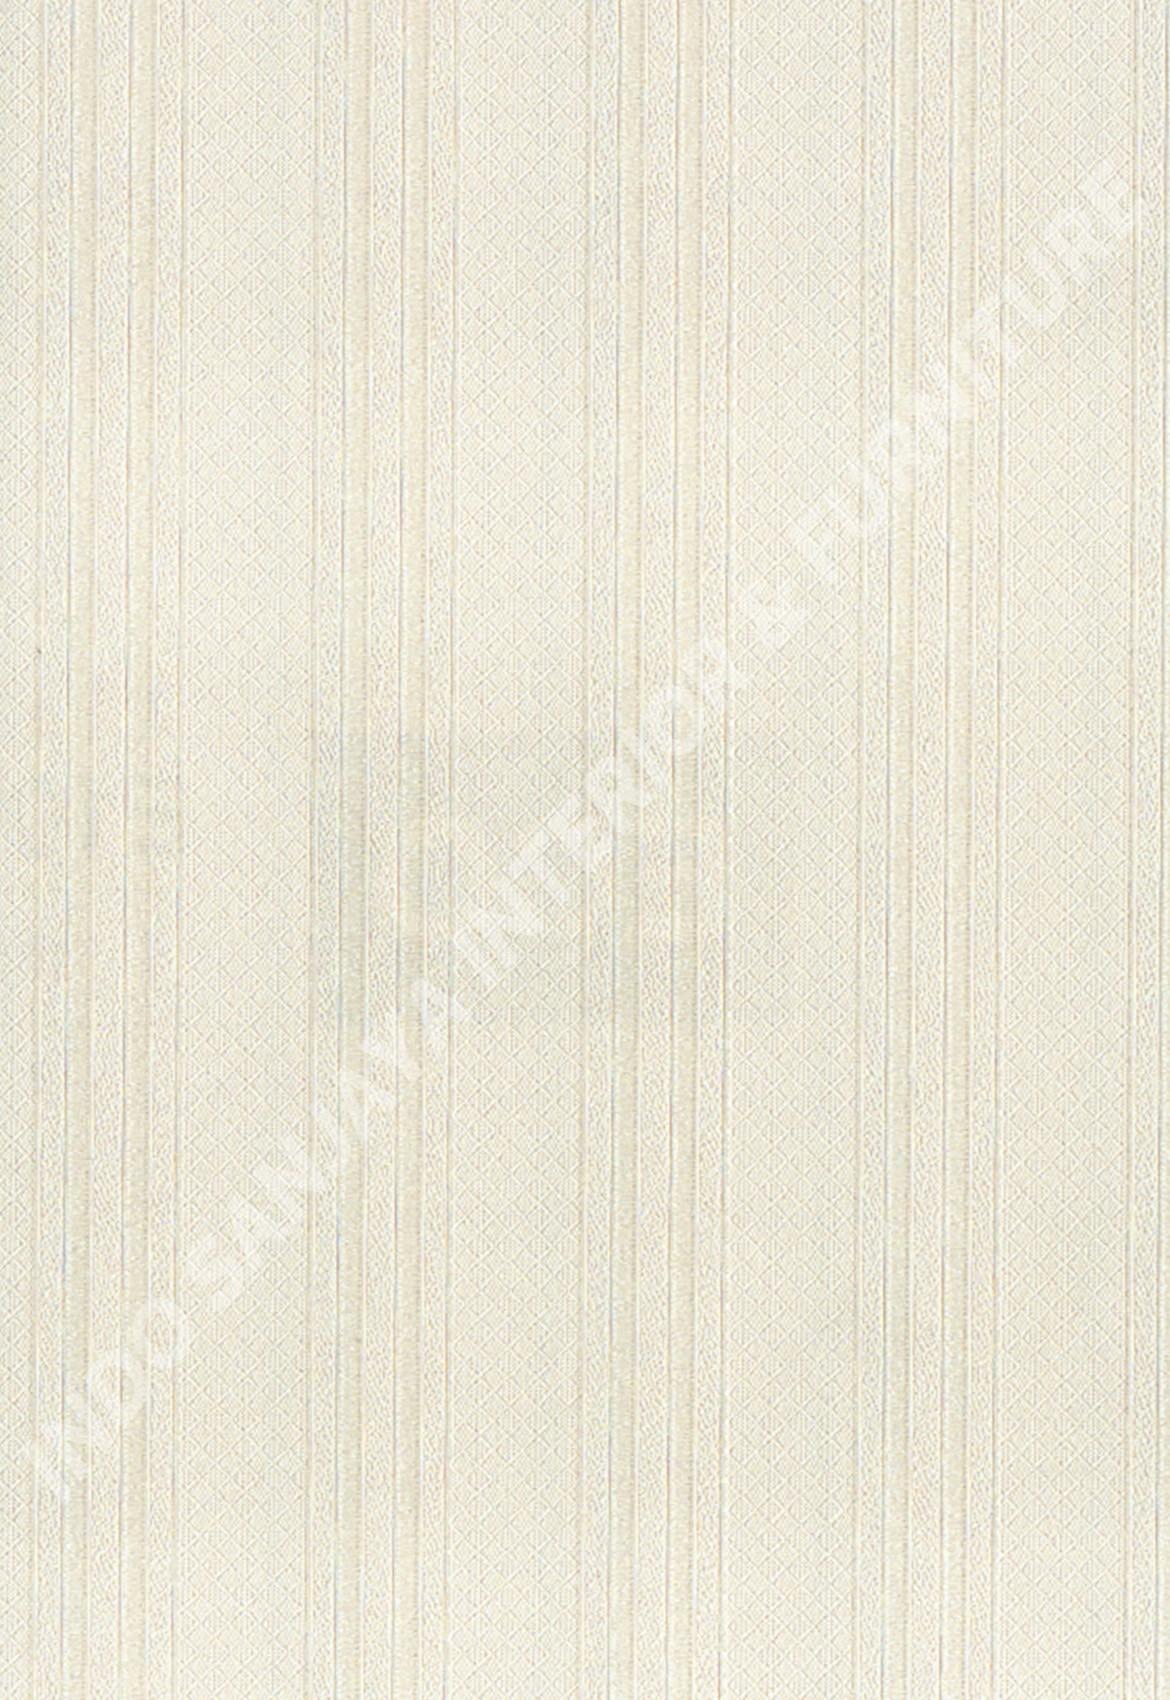 wallpaper   Wallpaper Minimalis Polos E10503:E10503 corak  warna